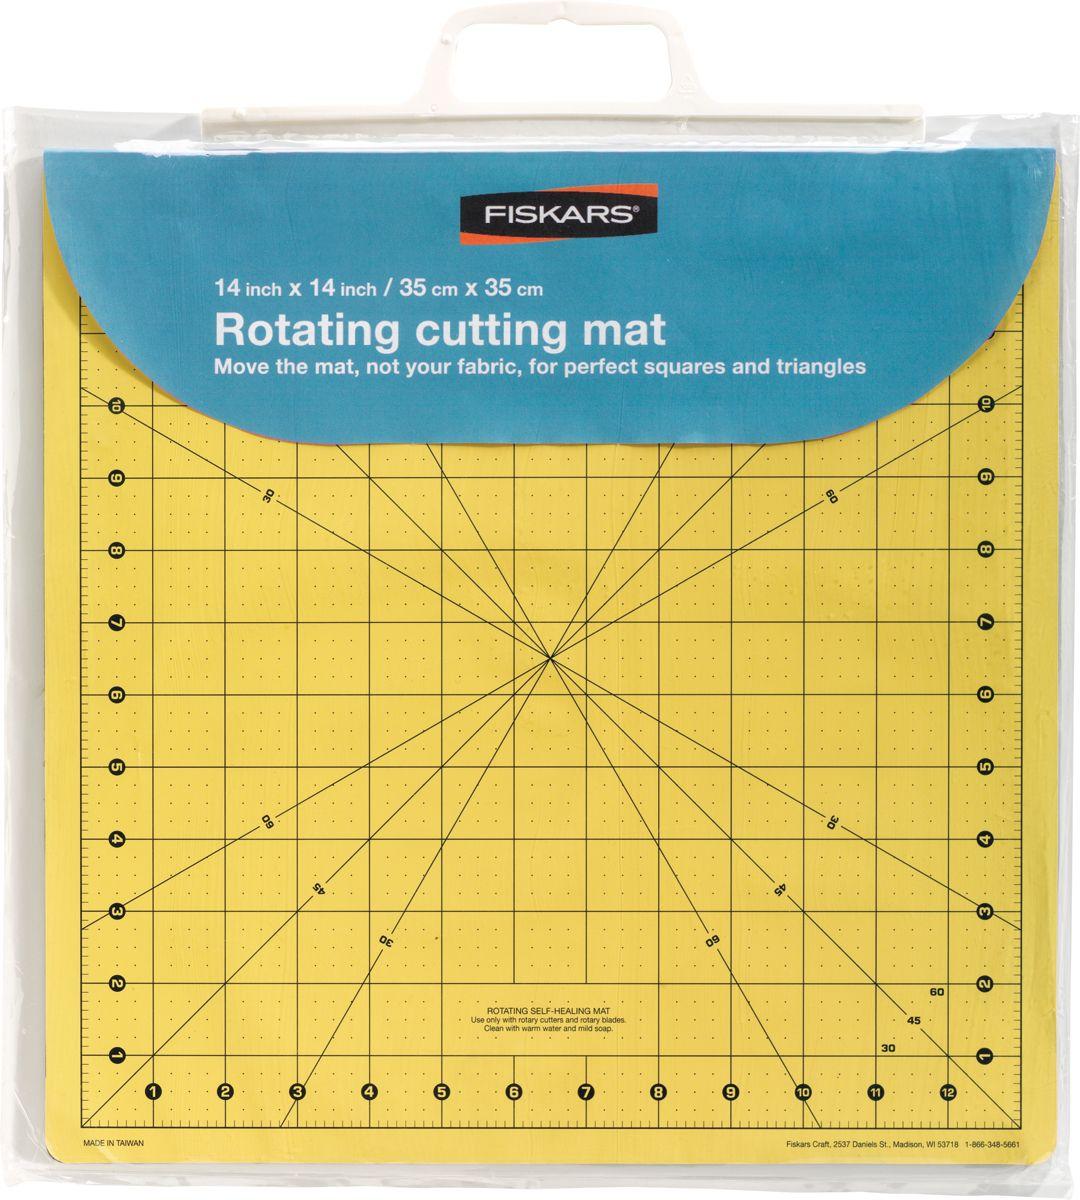 "Fiskars 14""x14"" Rotating Cutting Mat PartNumber: 02006647000P"